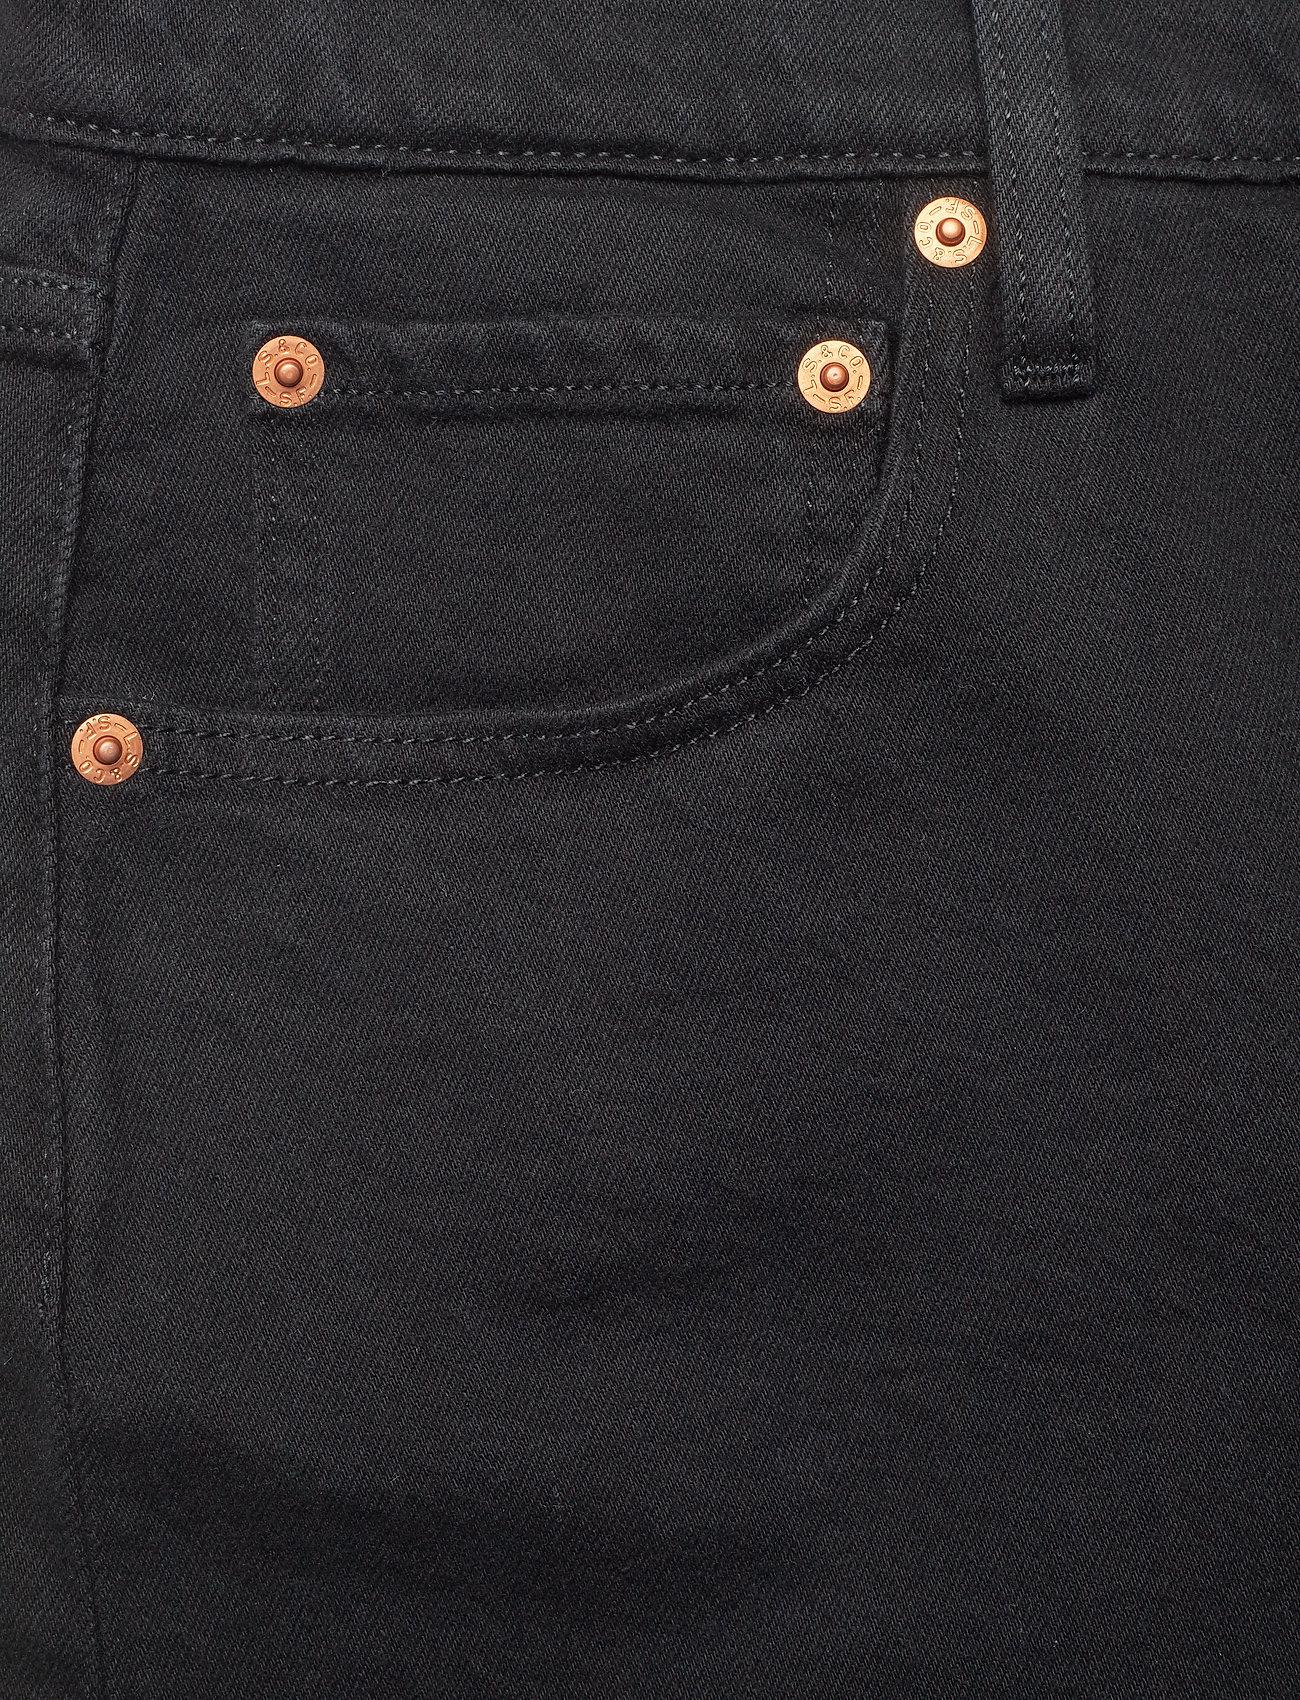 LEVI´S Women - 501 CROP BLACK SPROUT - raka jeans - blacks - 2